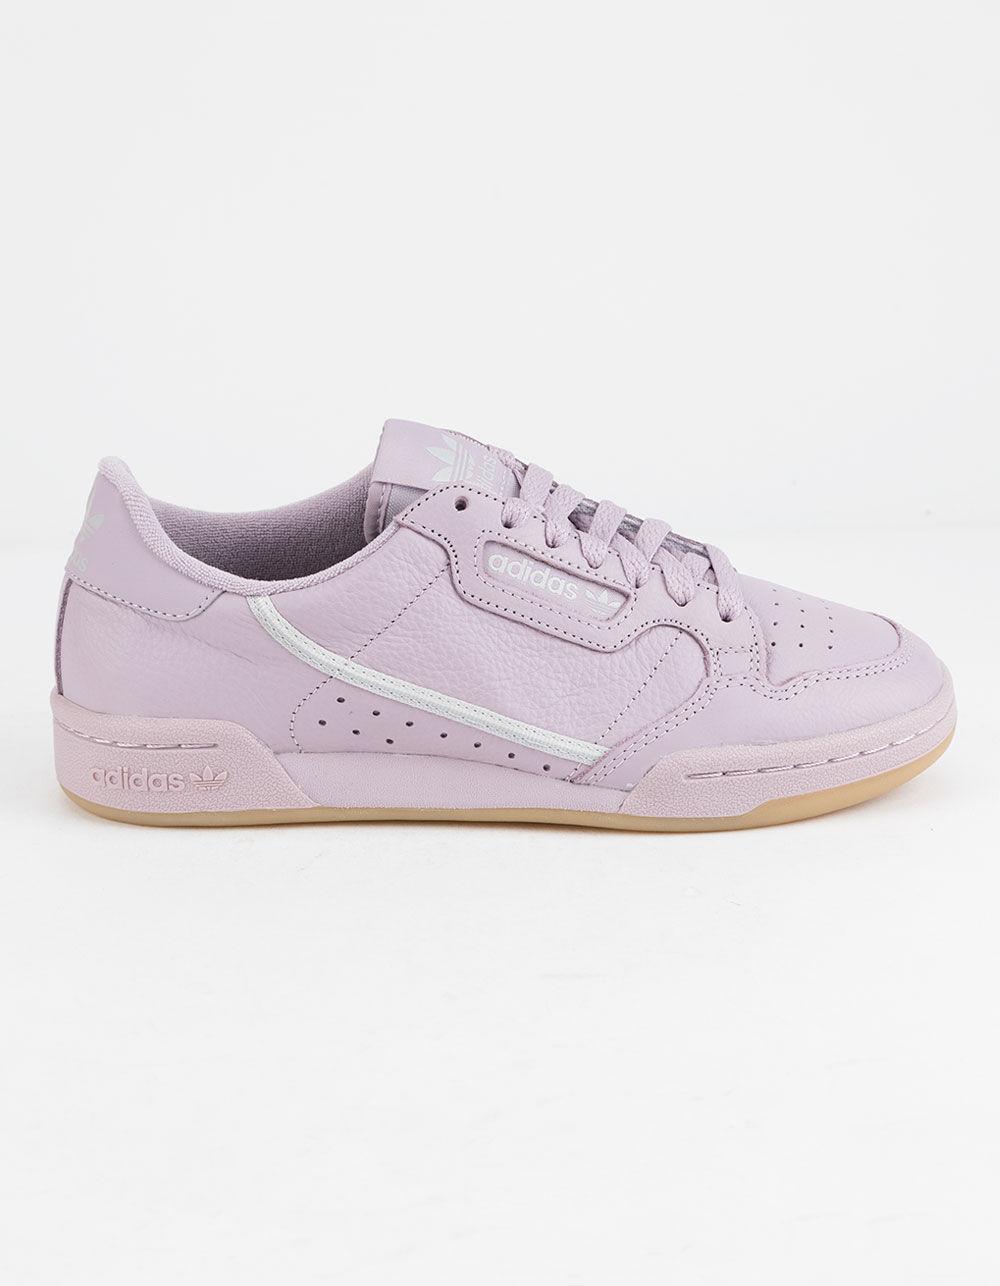 ADIDAS Continental 80 Soft Vision Shoes